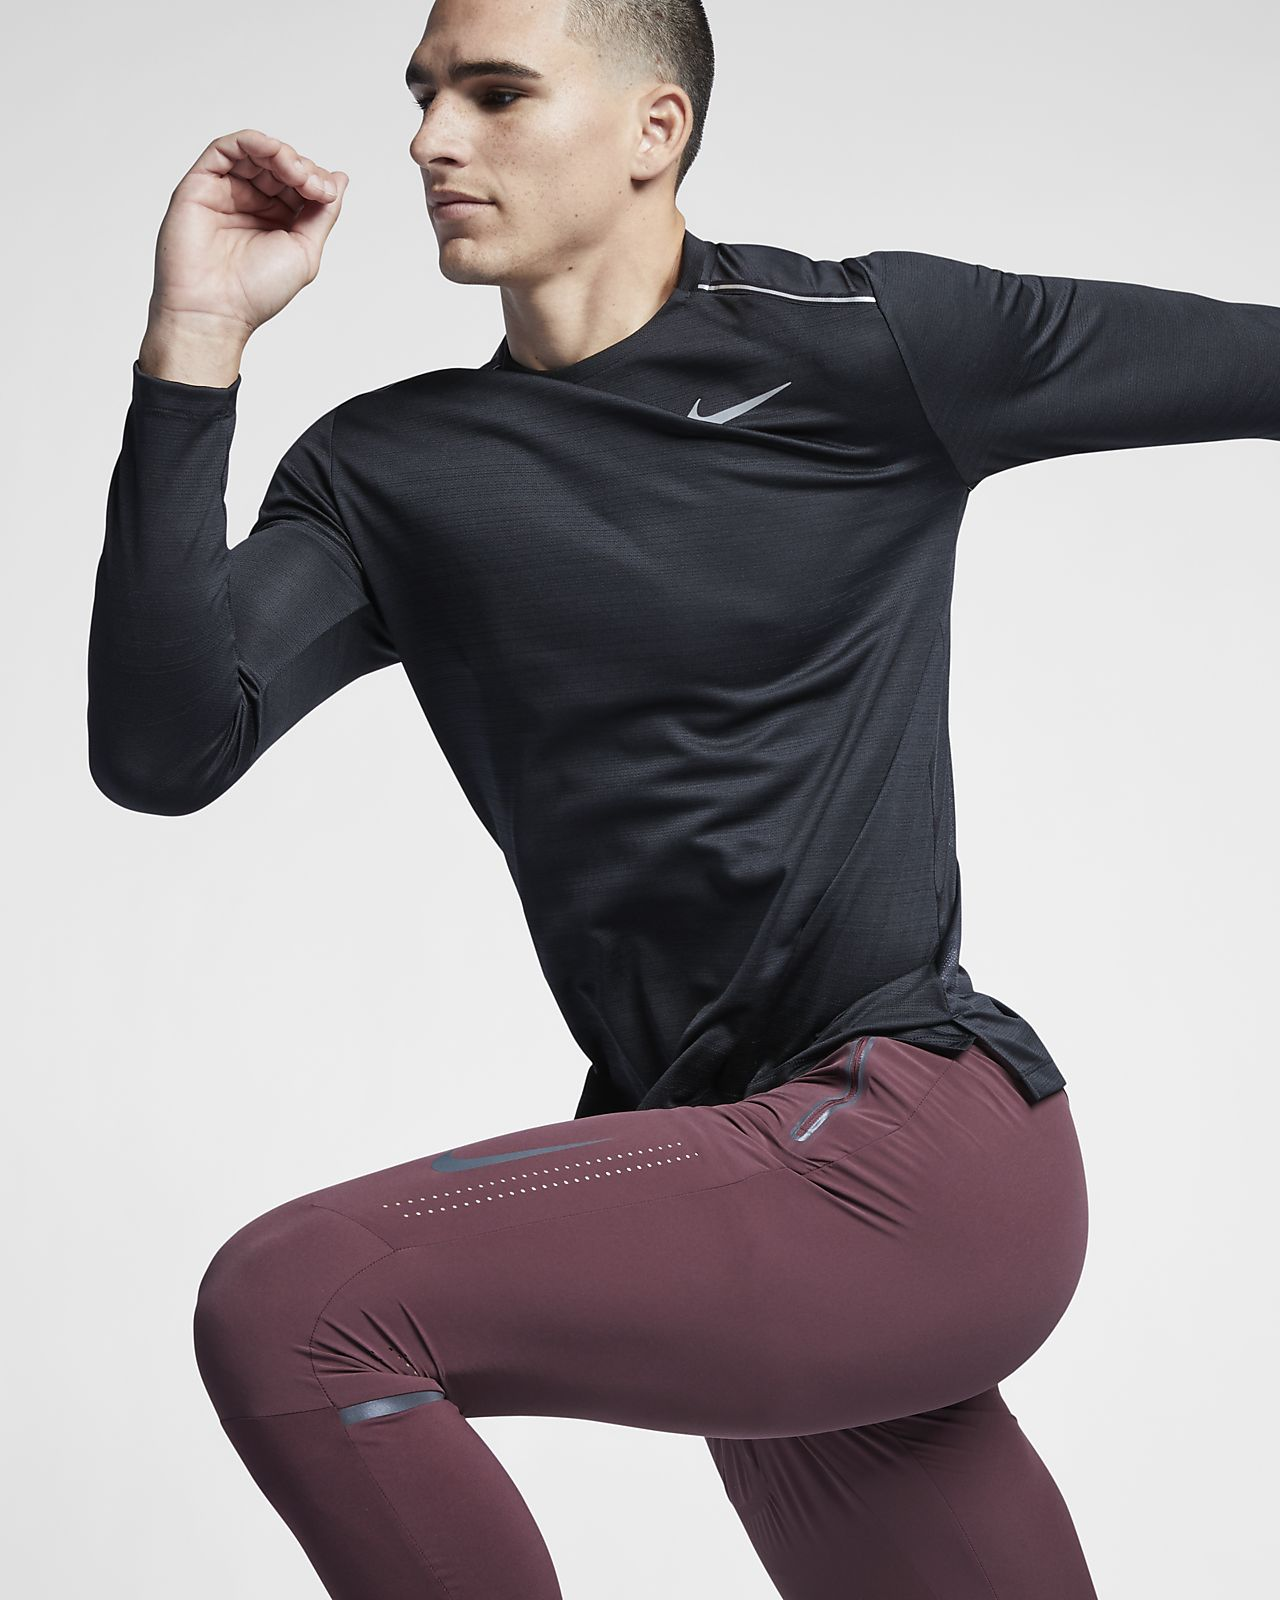 Nike Dri-FIT Miler langermet løpeoverdel til herre